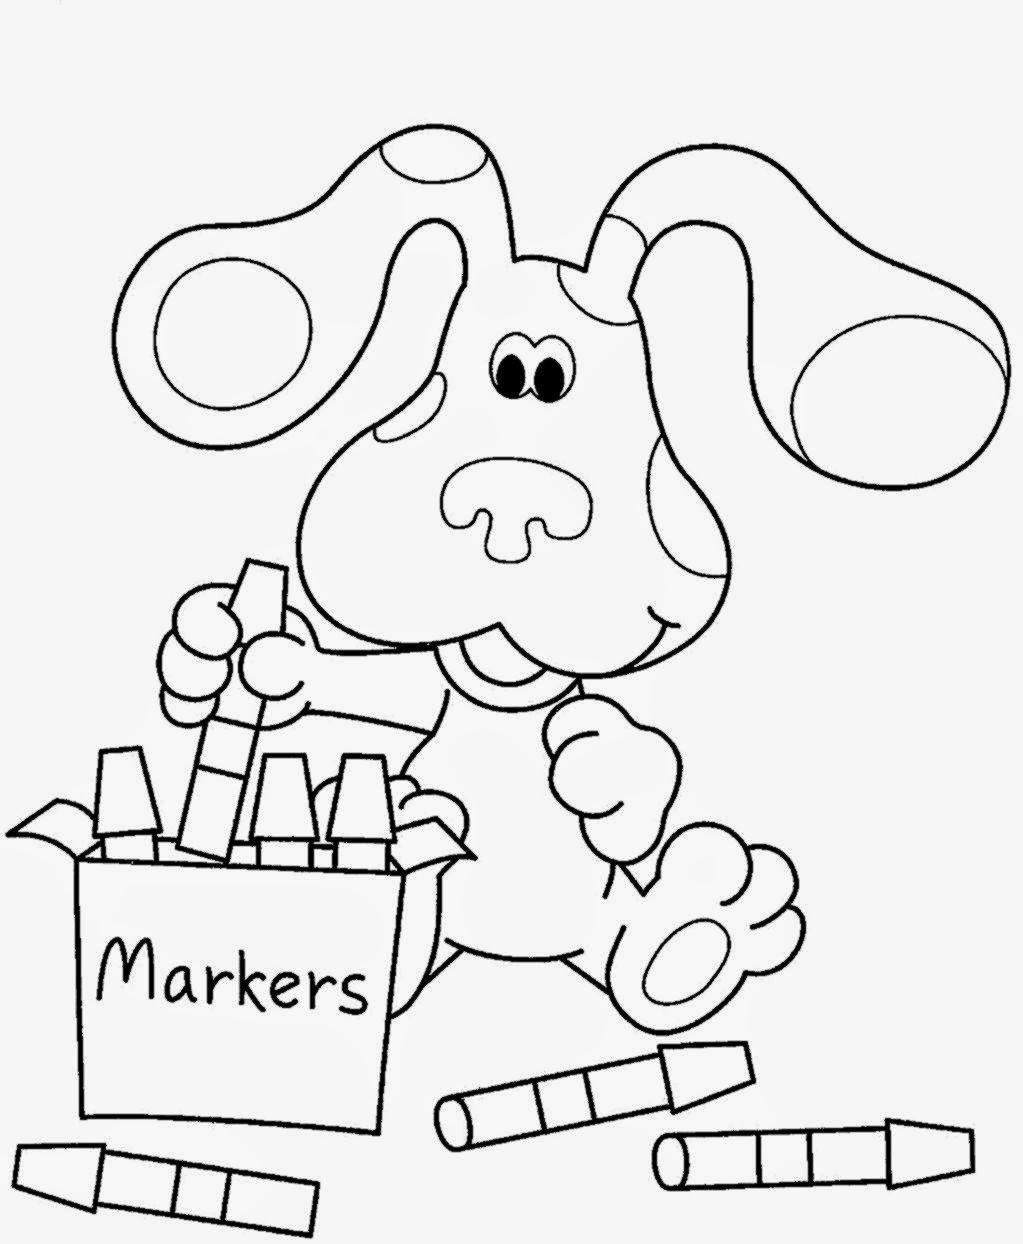 Crayola coloring sheets free coloring sheet for Christmas coloring pages crayola